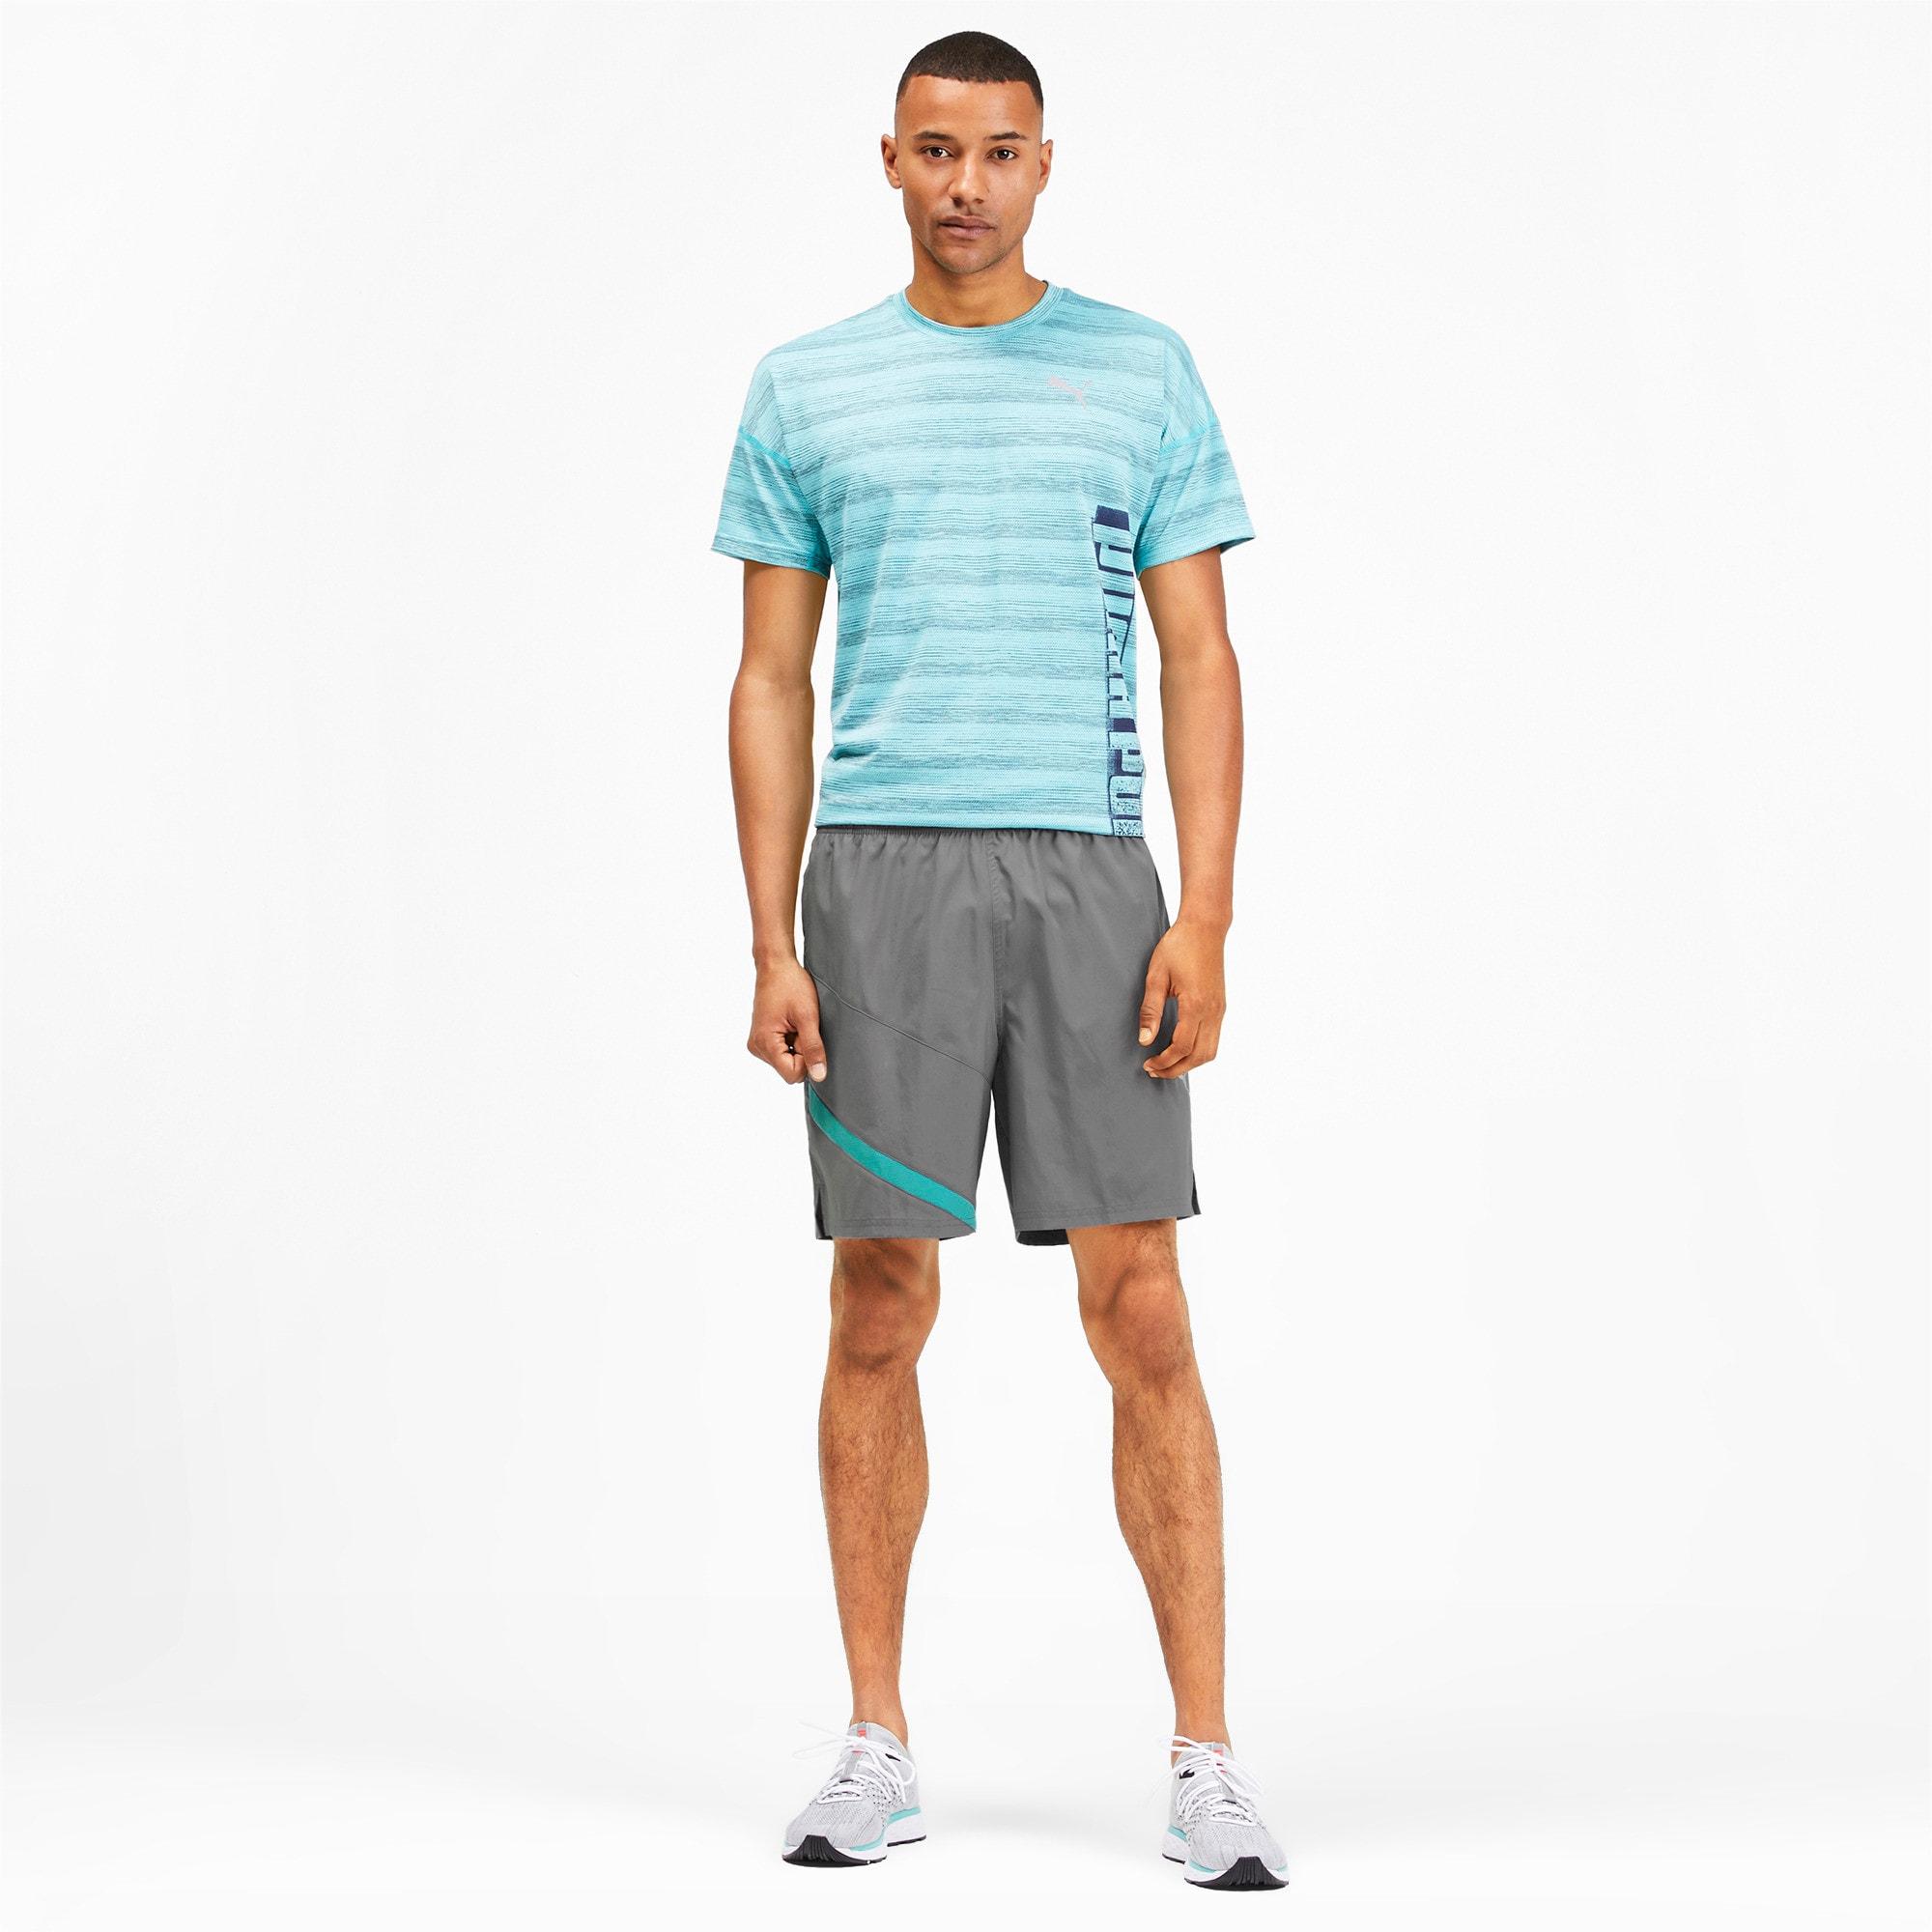 "Miniatura 3 de Shorts Ignite Blocked de 7"" para hombre, CASTLEROCK-Blue Turquoise, mediano"